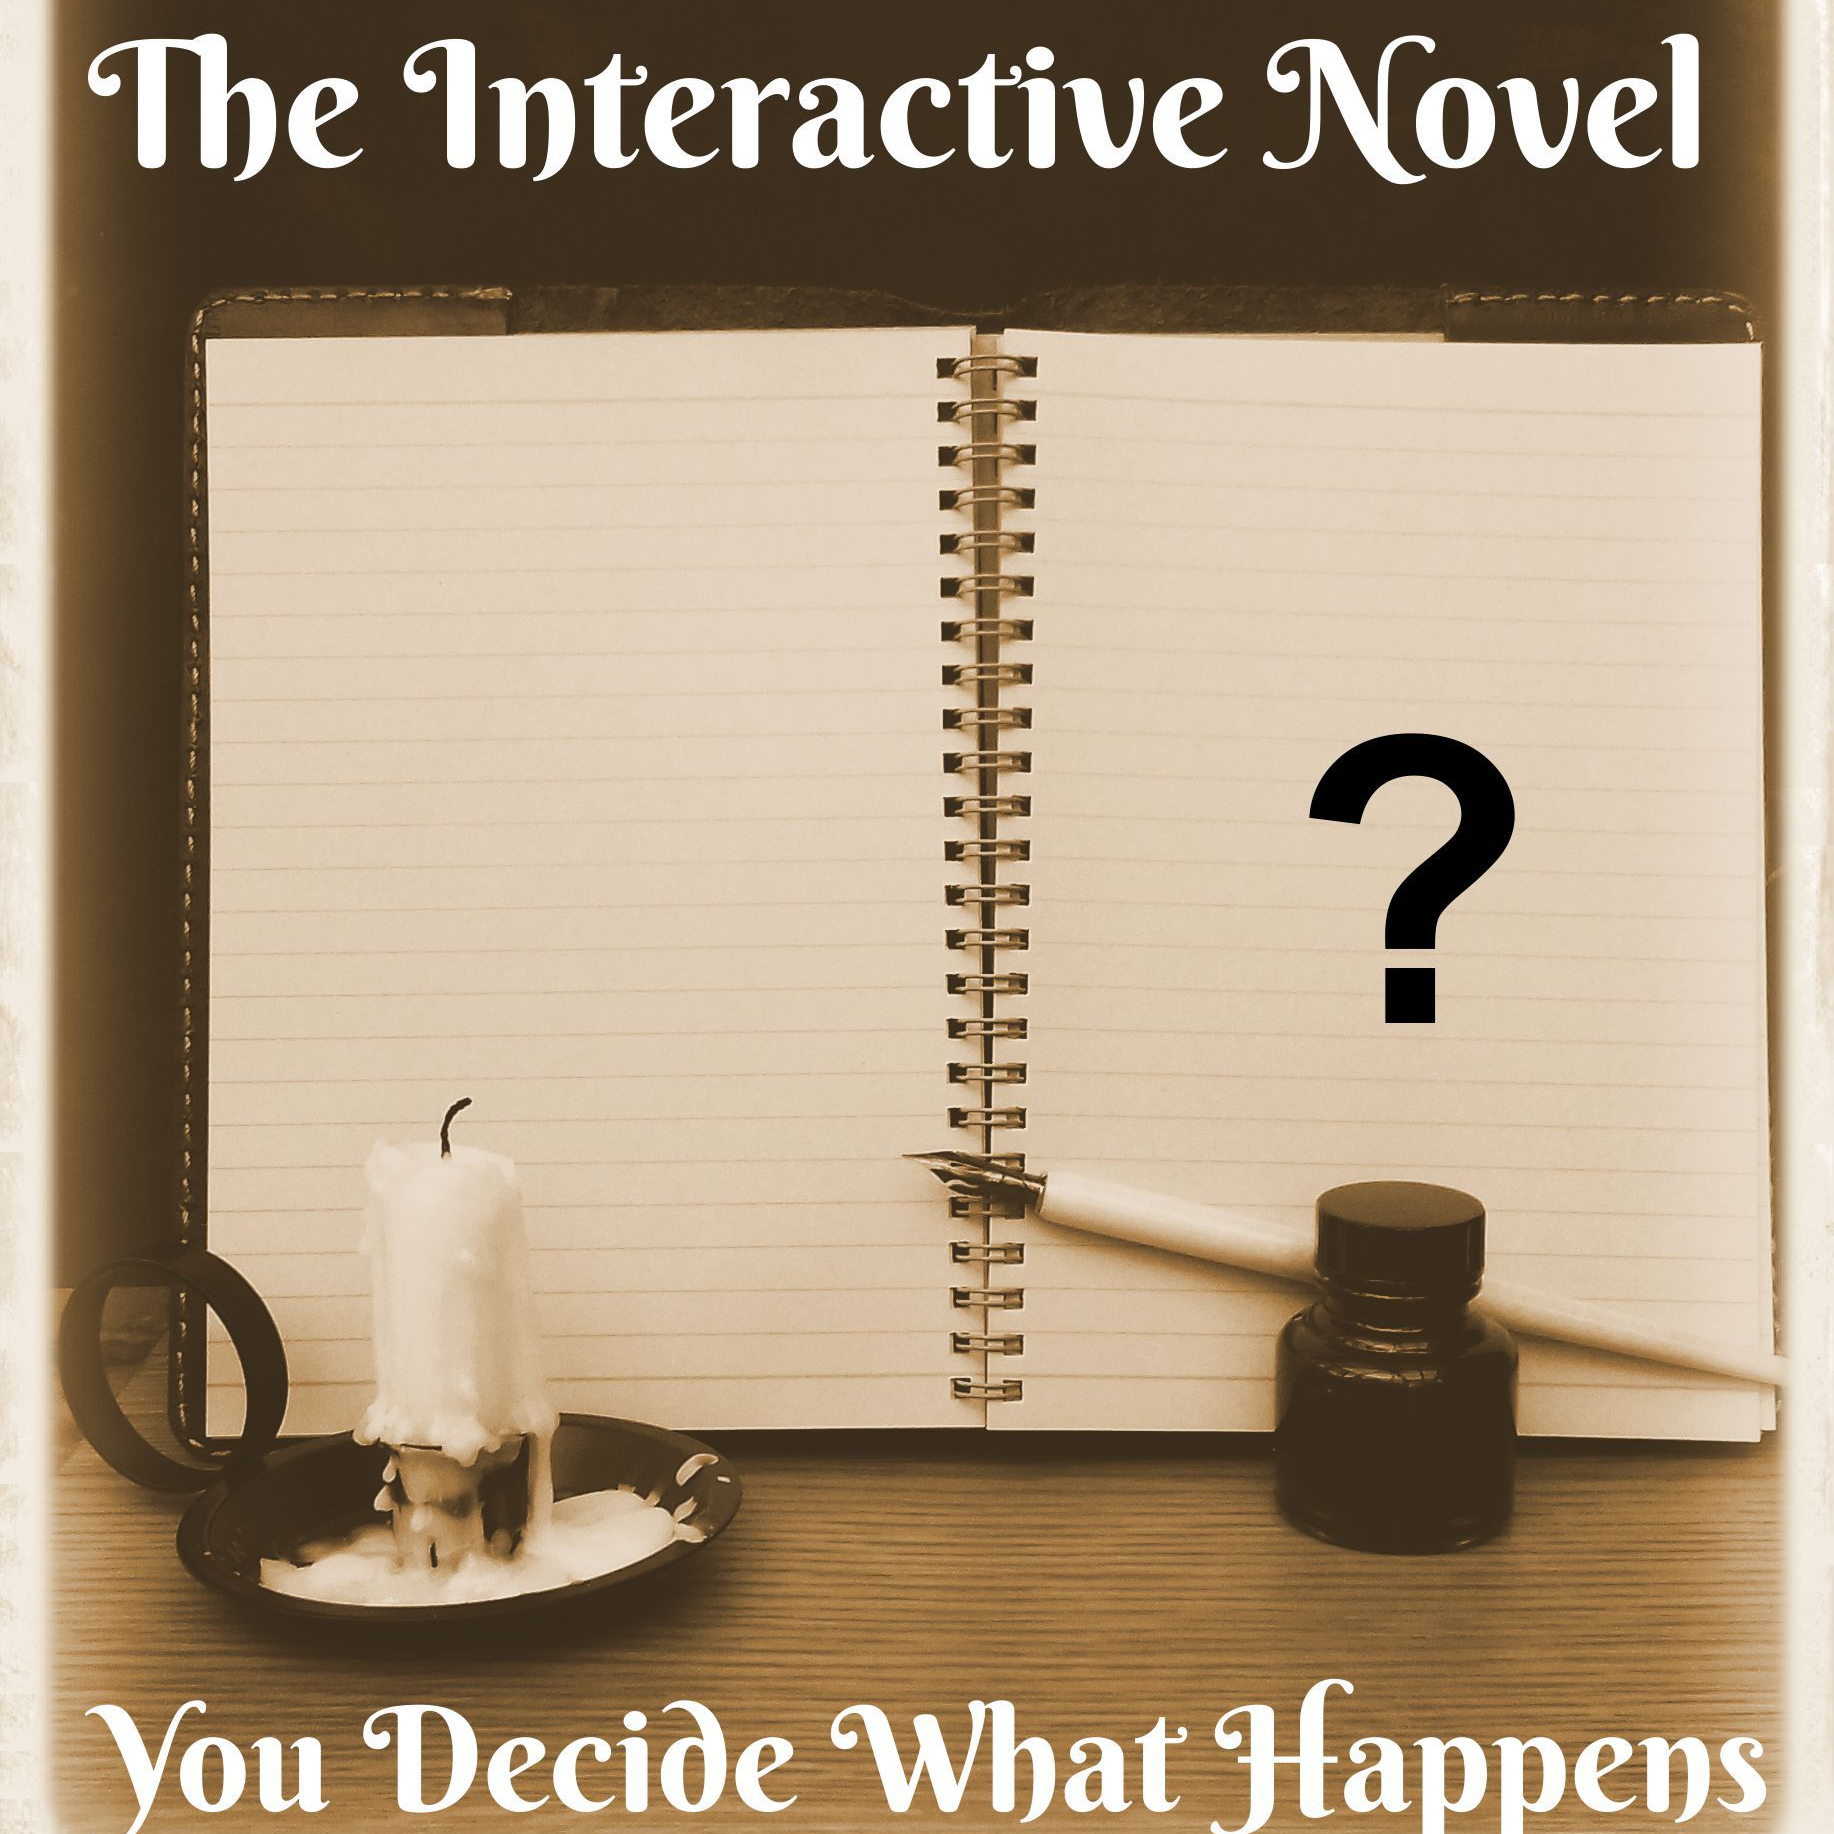 The Interactive Novel